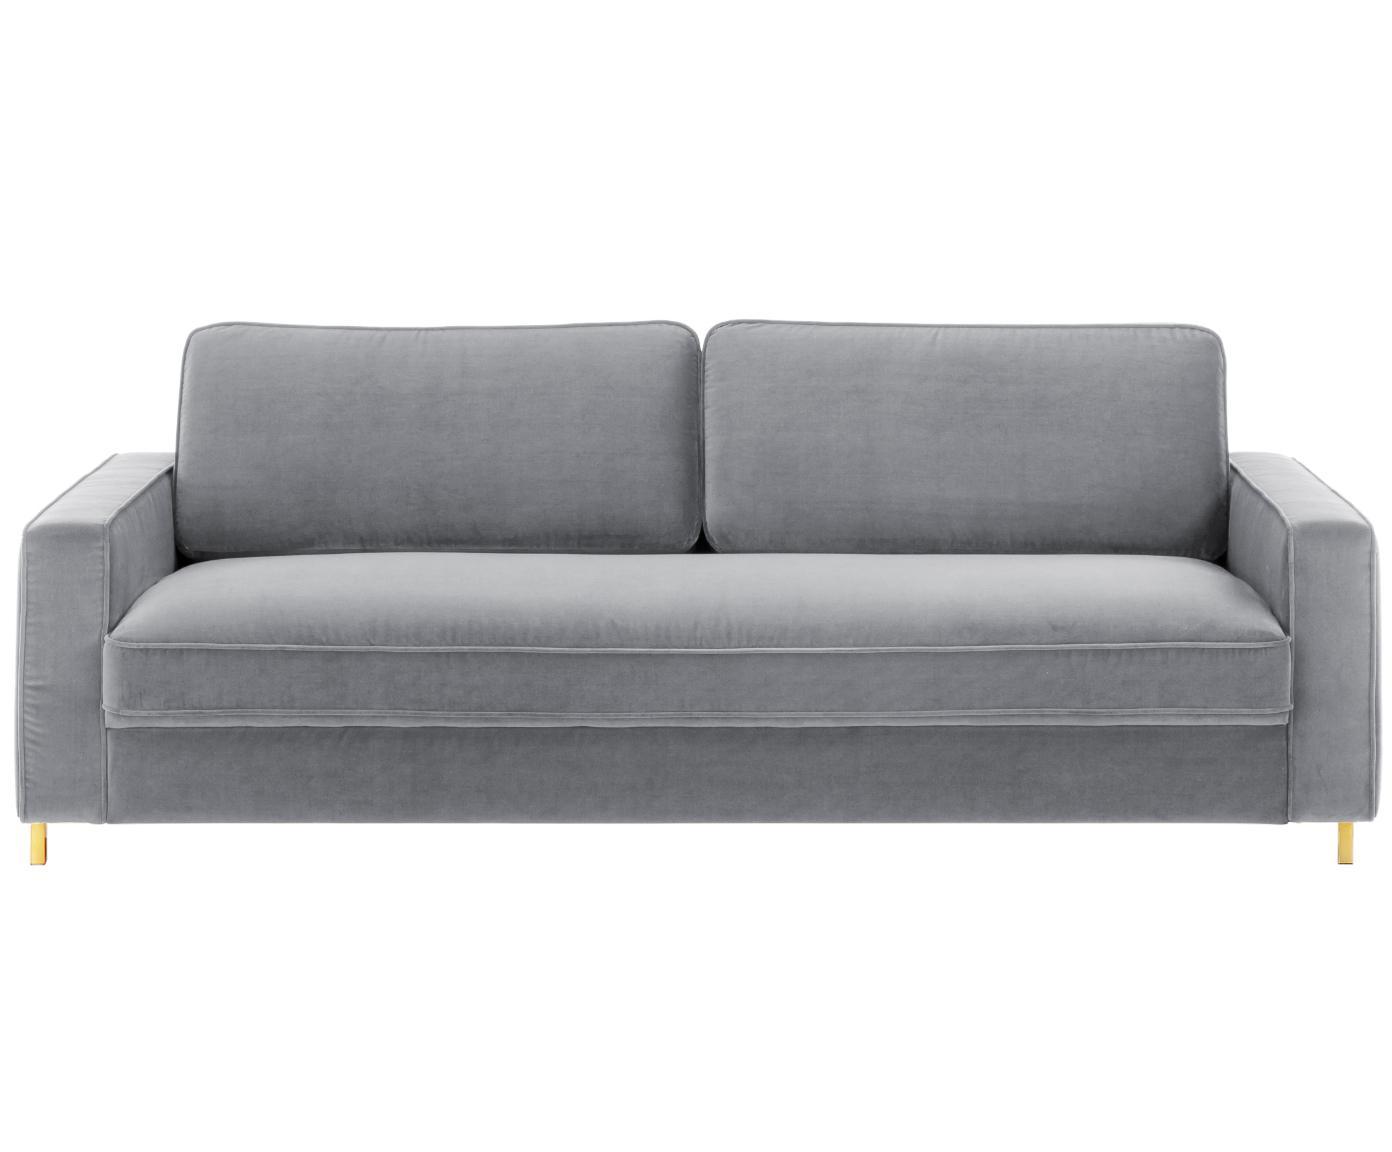 Samt-Sofa Chelsea (3-Sitzer), Bezug: Samt (Hochwertiger Polyes, Gestell: Massives Fichtenholz, Samt Grau, B 228 x T 100 cm